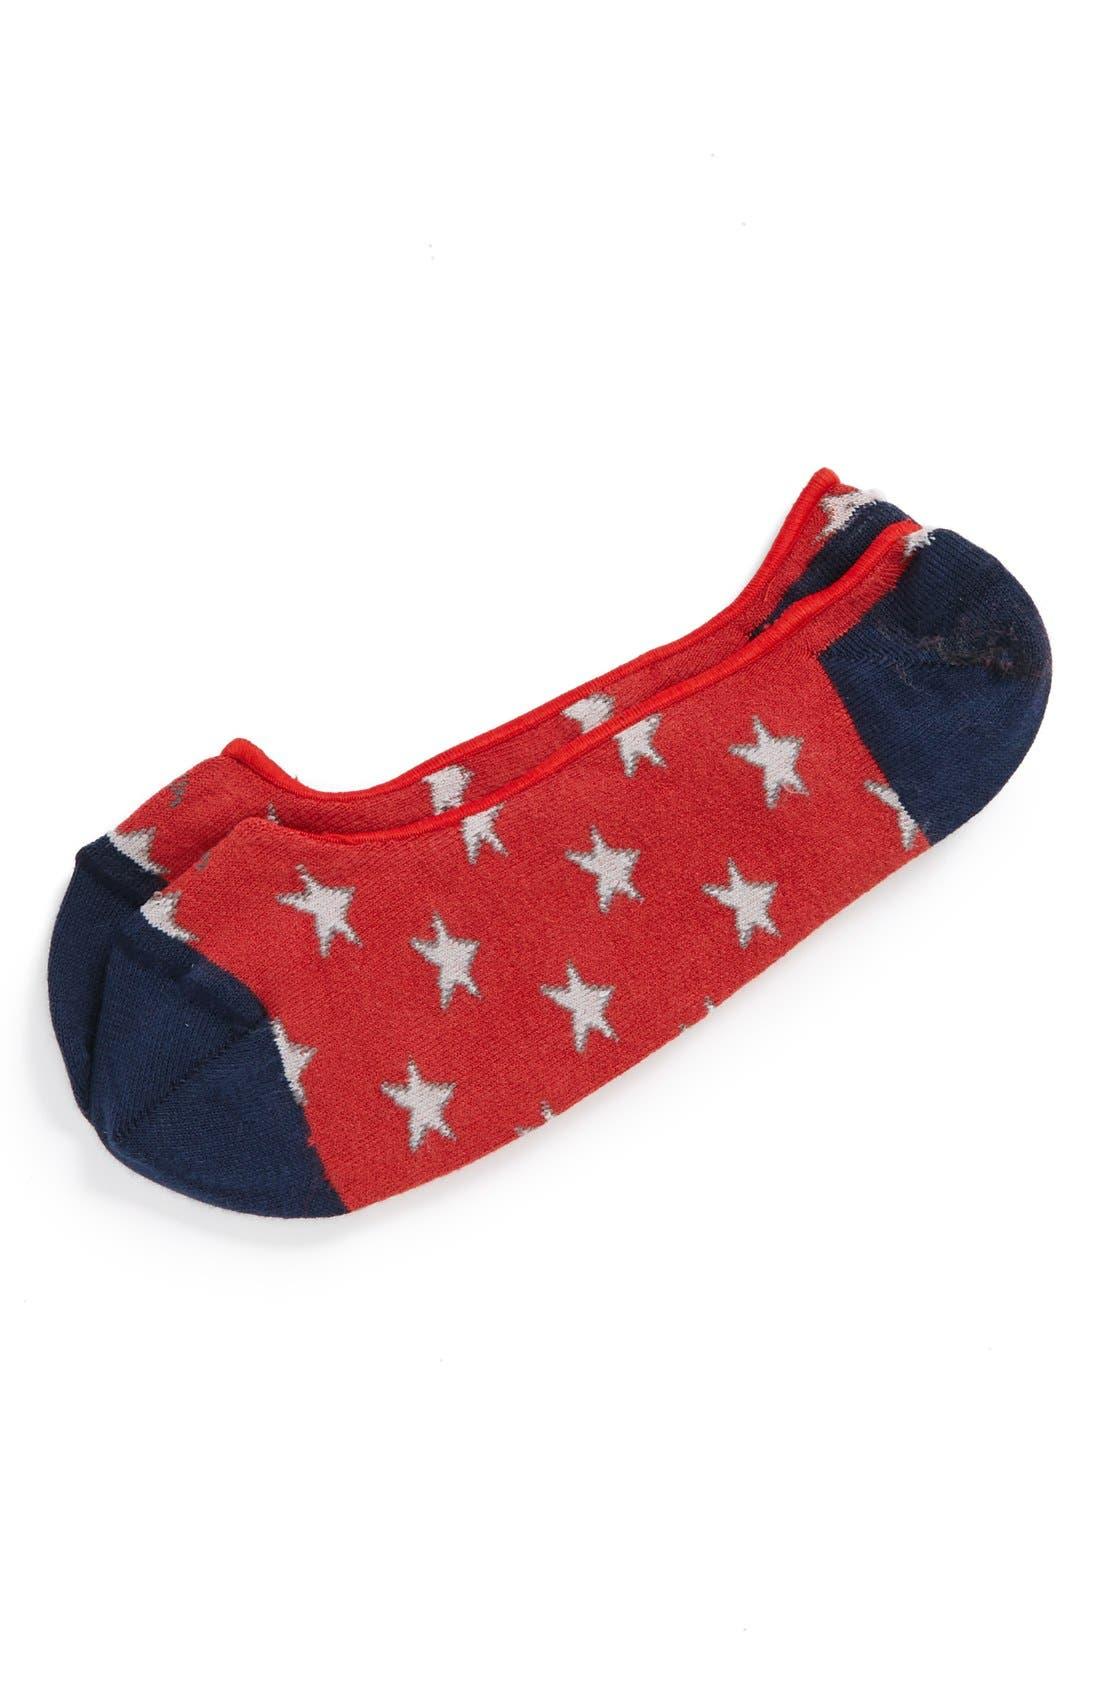 Alternate Image 1 Selected - hook + ALBERT 'Stars and Stripes' No-Show Socks